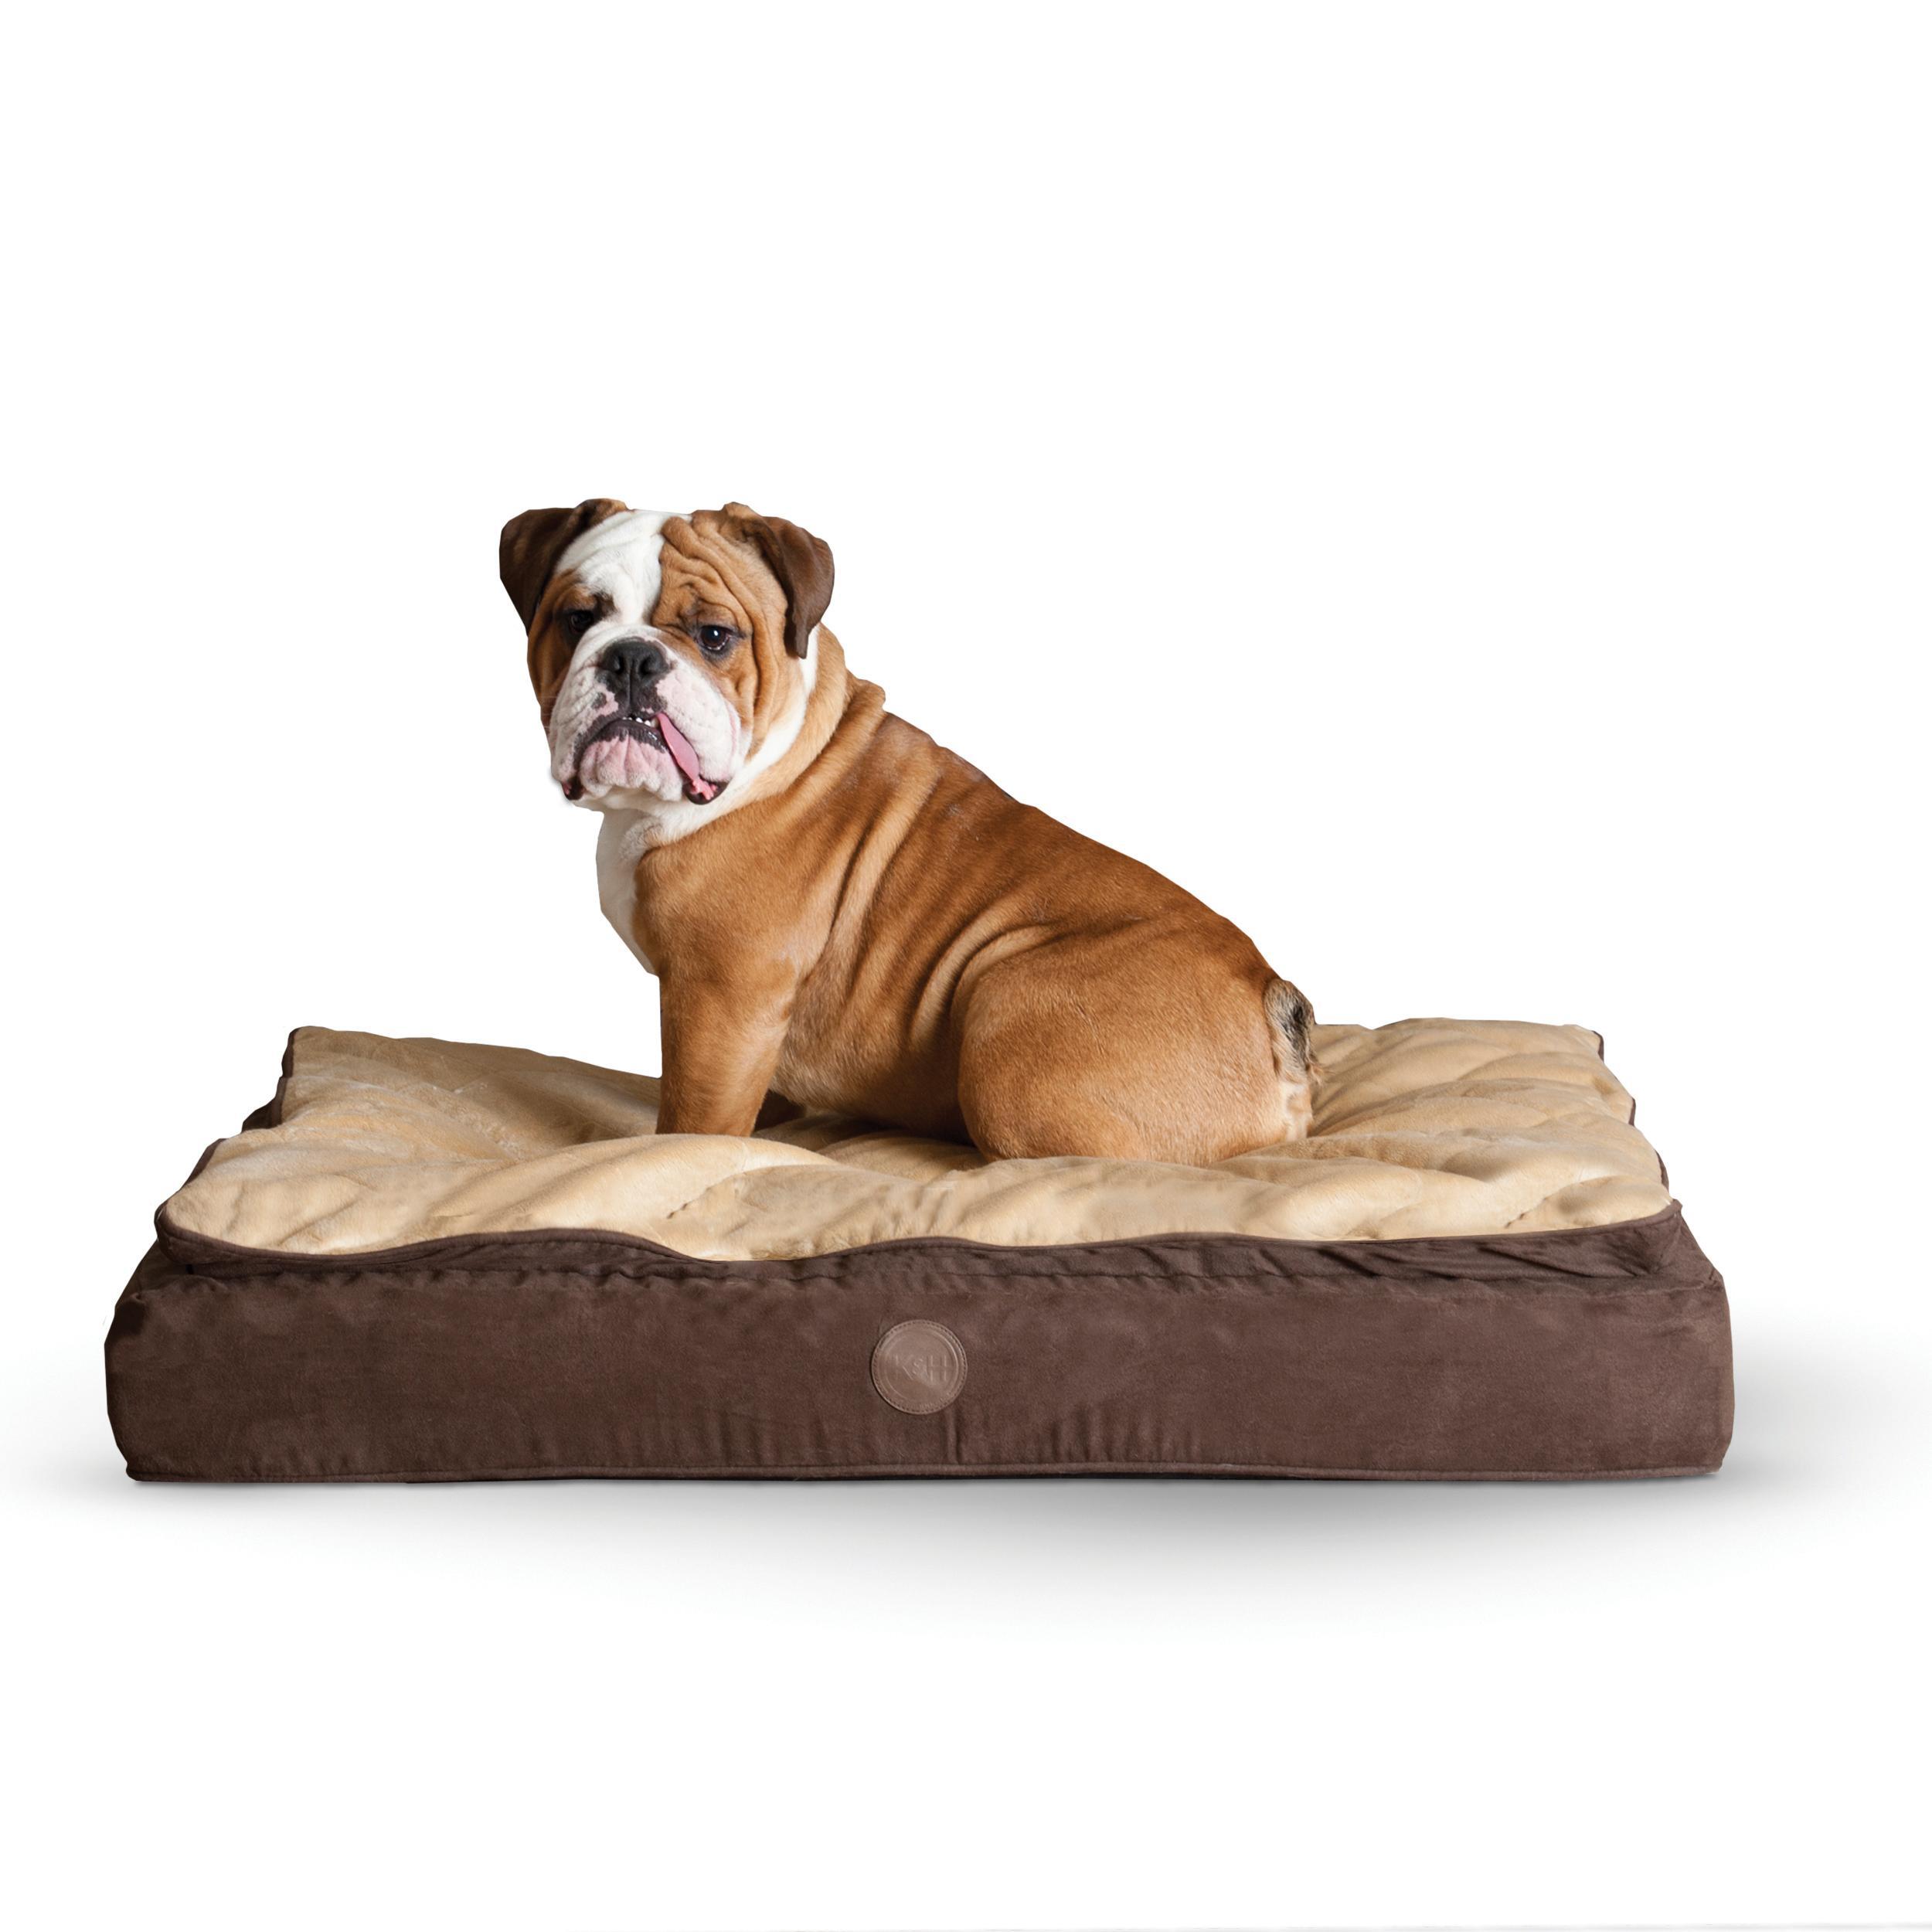 santacruz image dog orthopedic having the pets of hoffmans importance at home bed beds